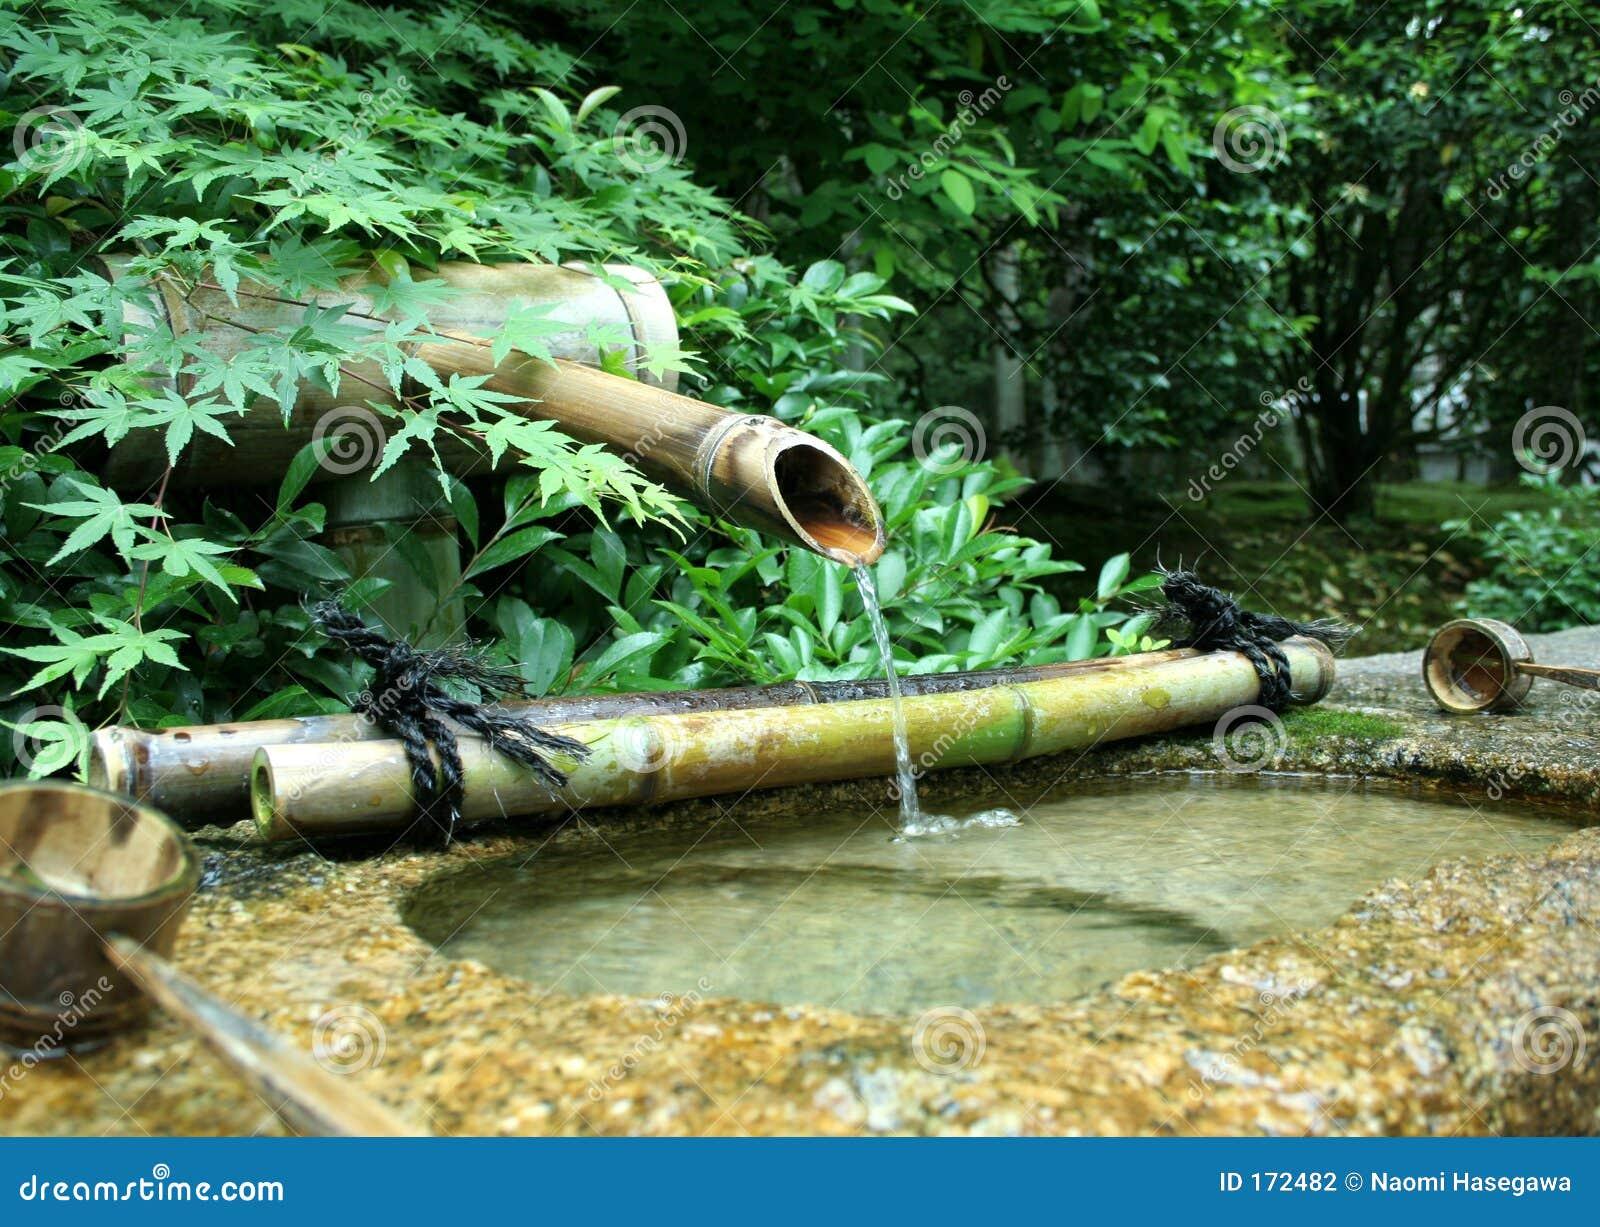 fonte de bambu japonesa foto de stock imagem de ladles 172482. Black Bedroom Furniture Sets. Home Design Ideas